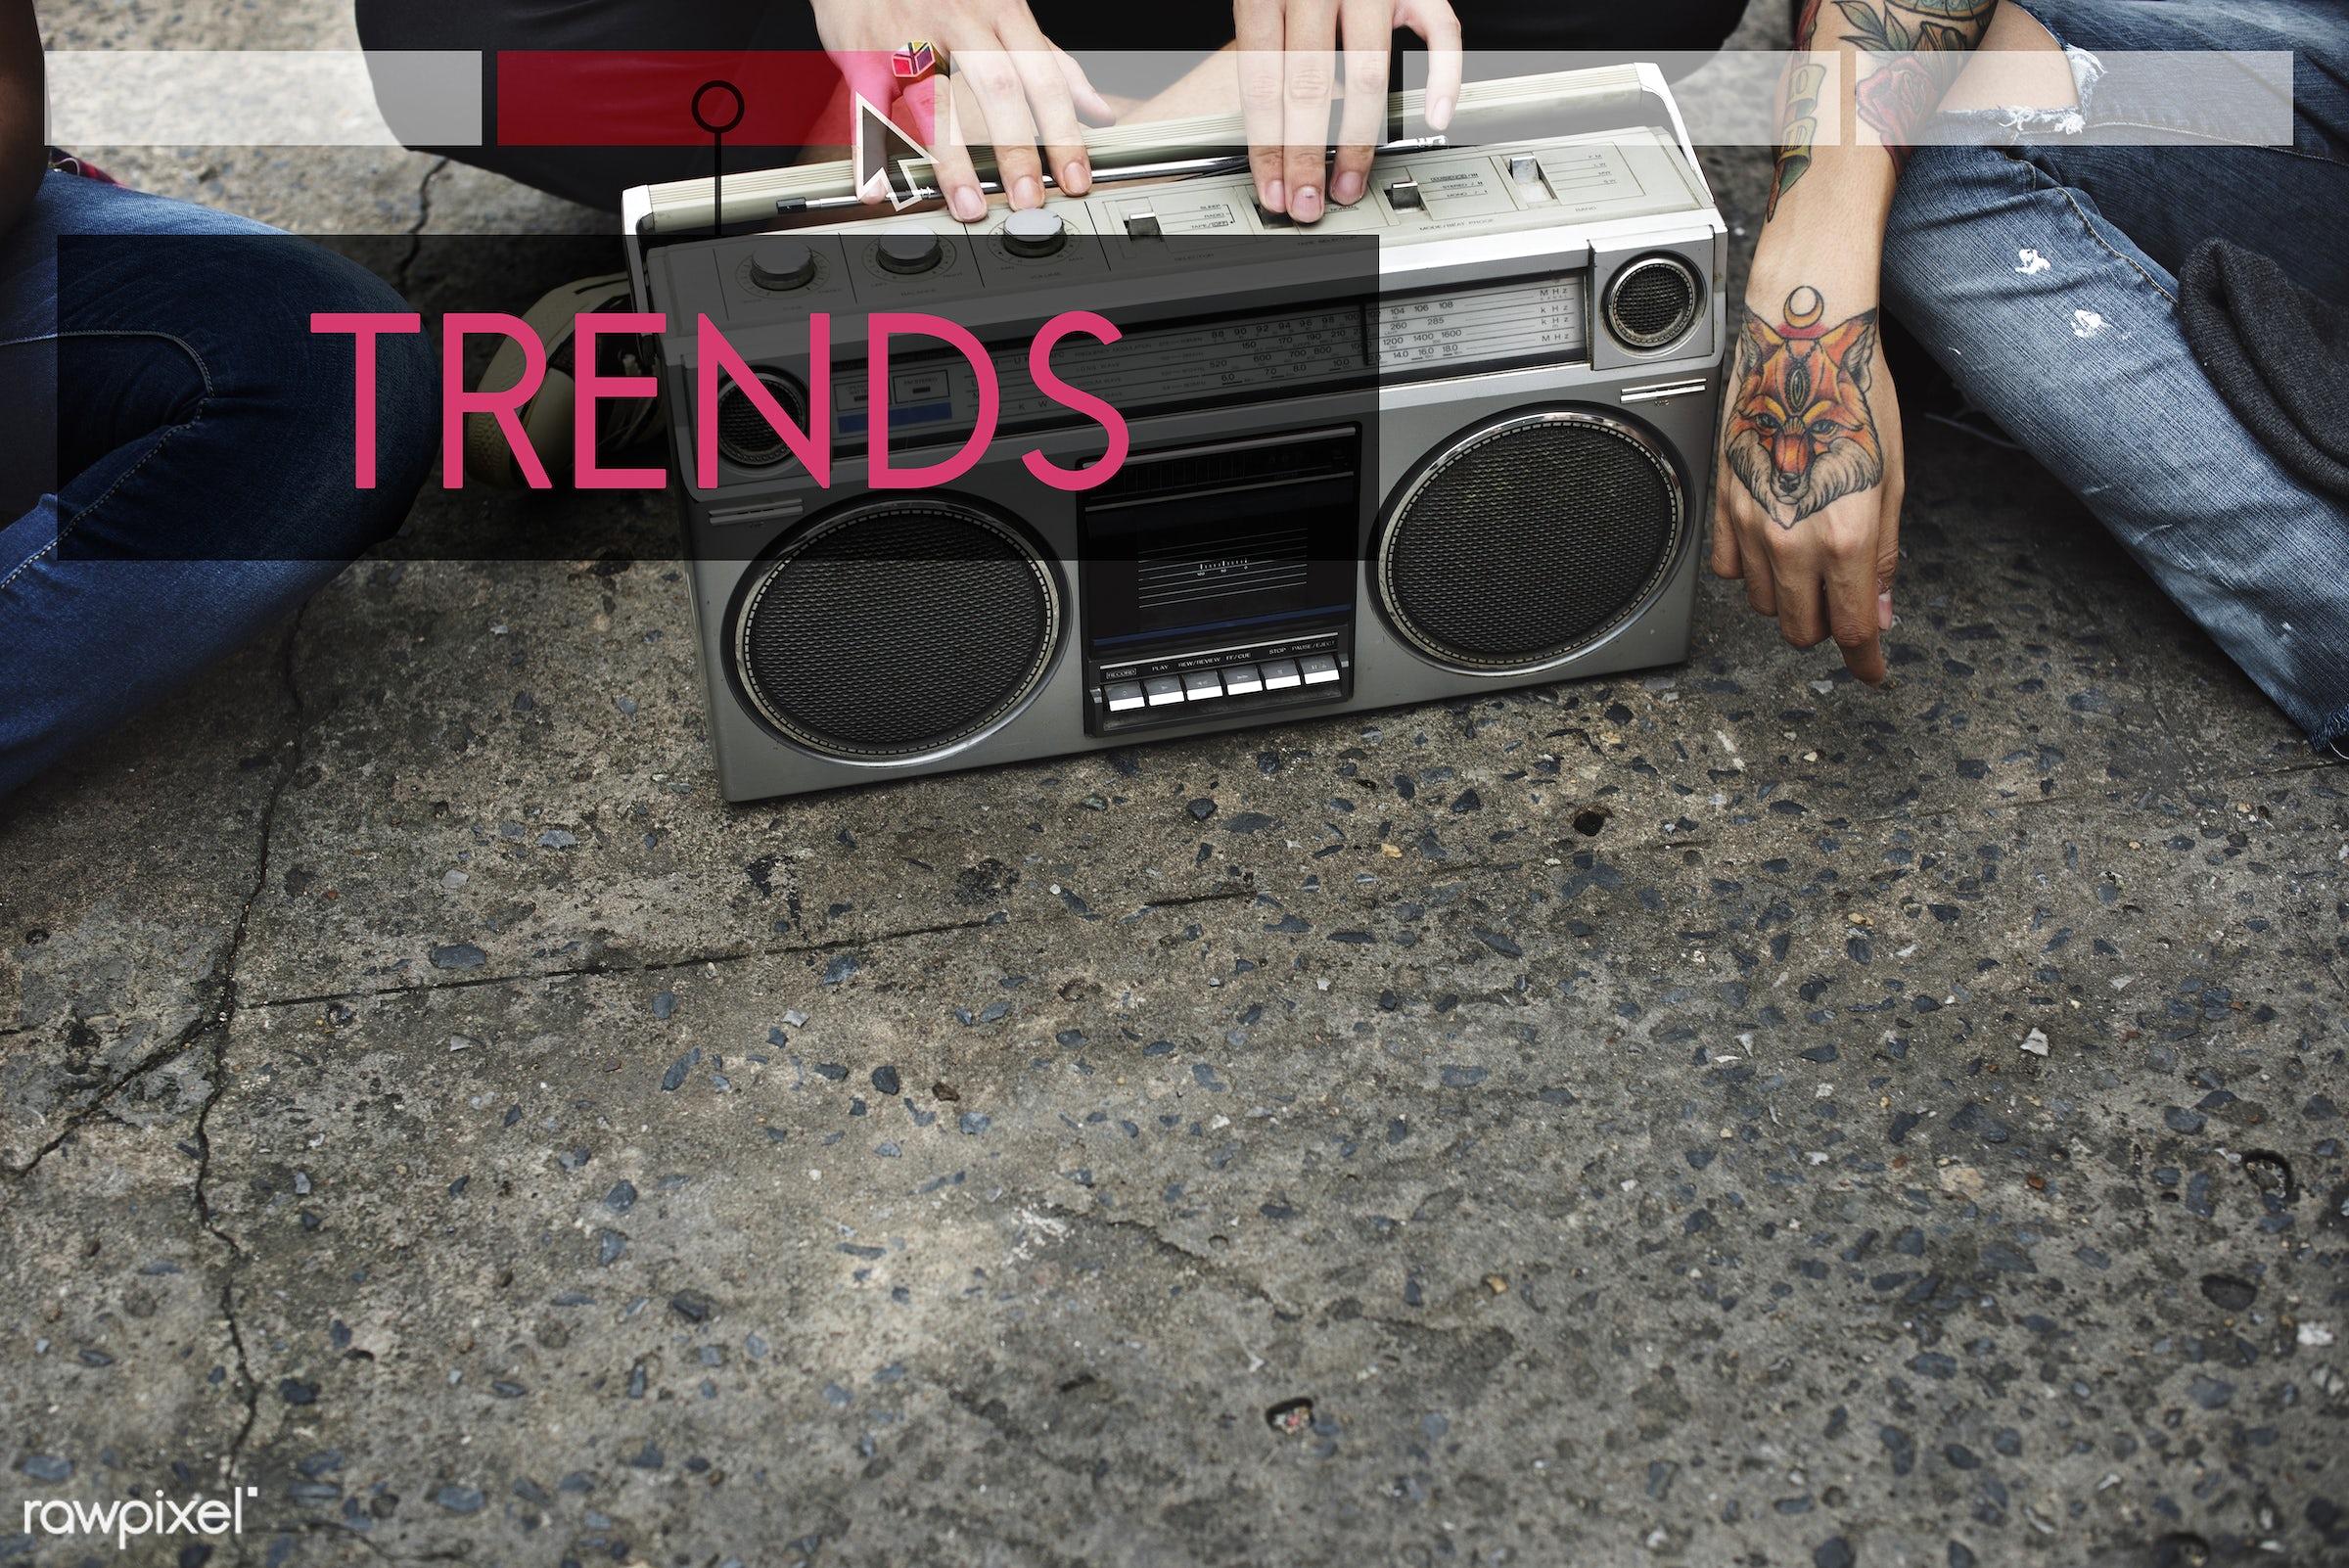 audio, box, design, enjoyment, entertain, entertainment, fashion, forecast, hands, hold, holding, hot, in, latest, leisure,...